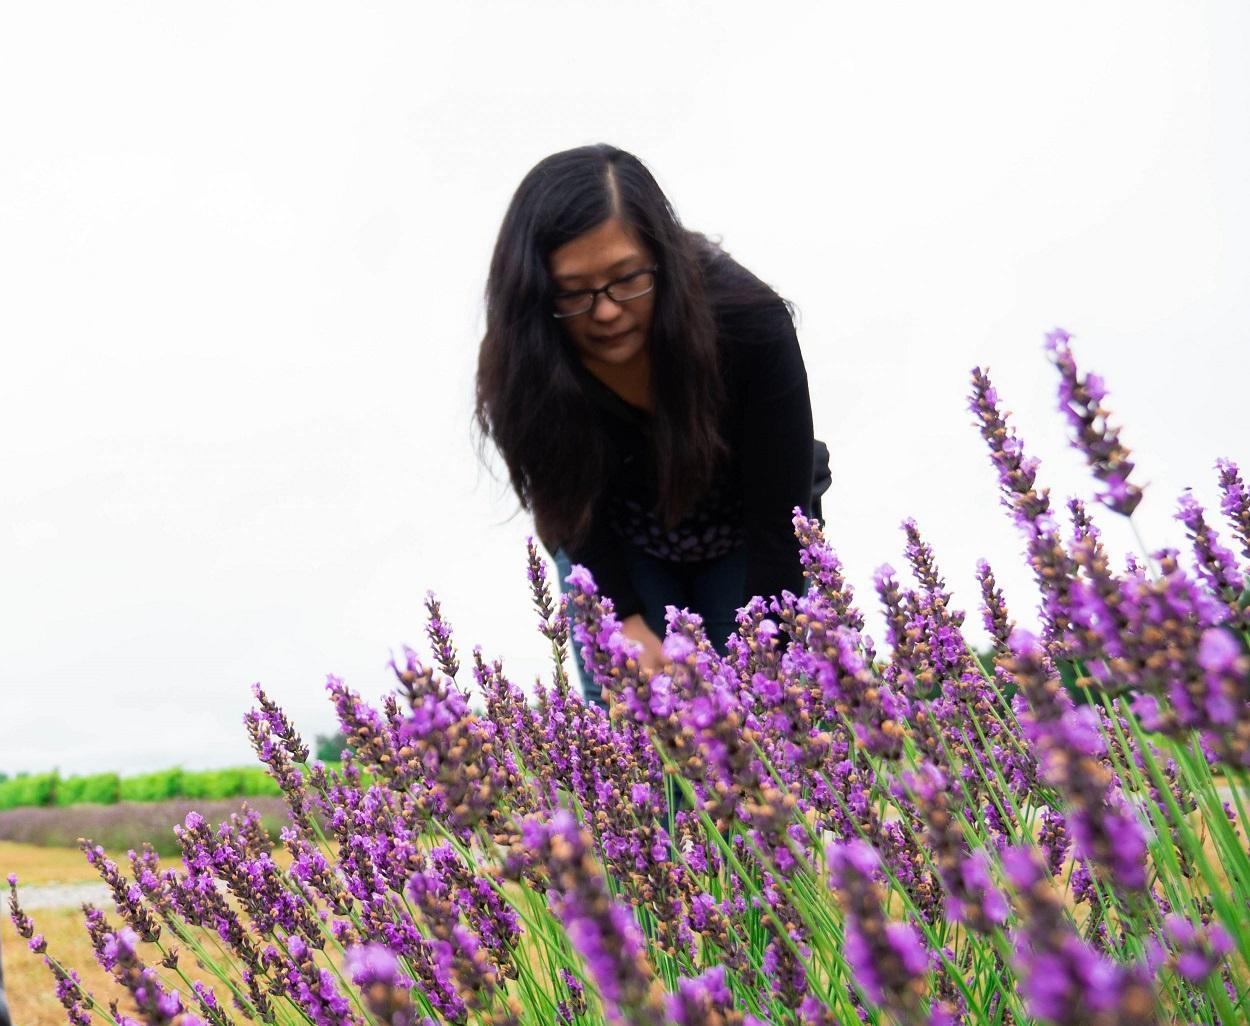 Joyce Leung lavender